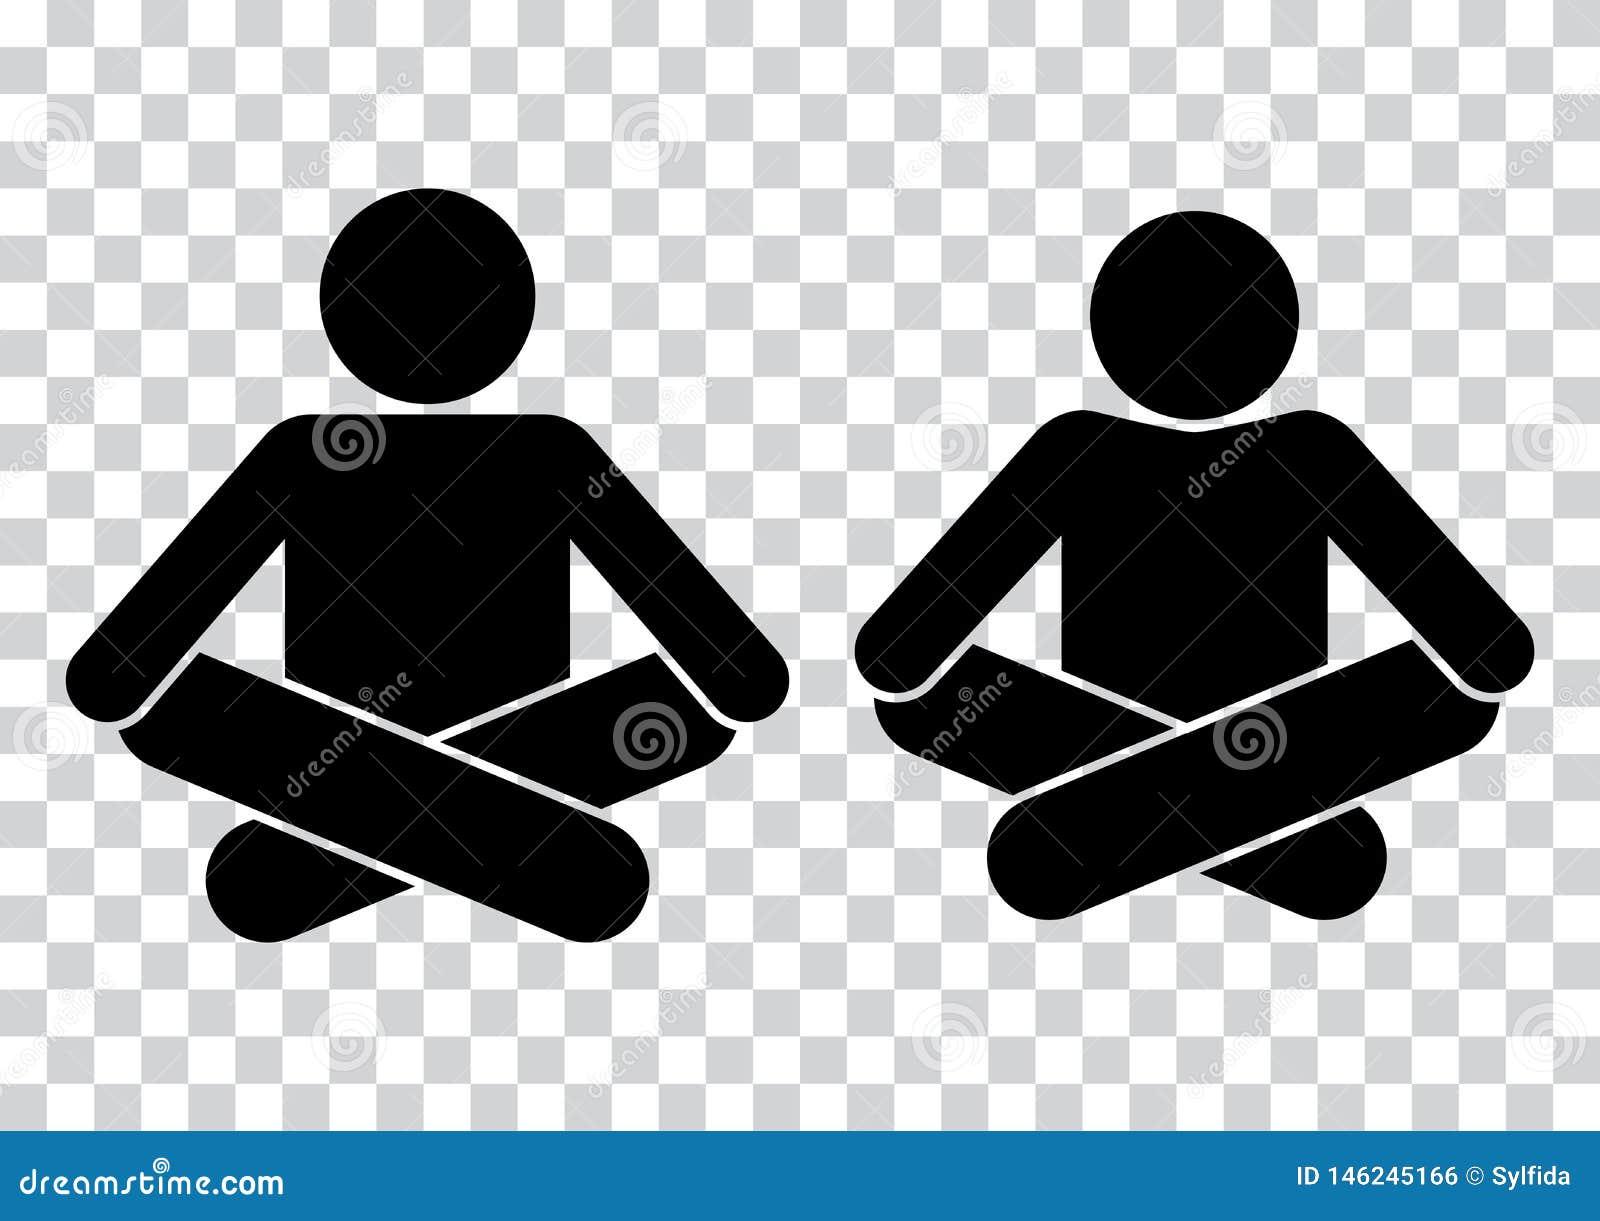 People. Meditation. Yoga icon. Black silhouettes. Vector illustration